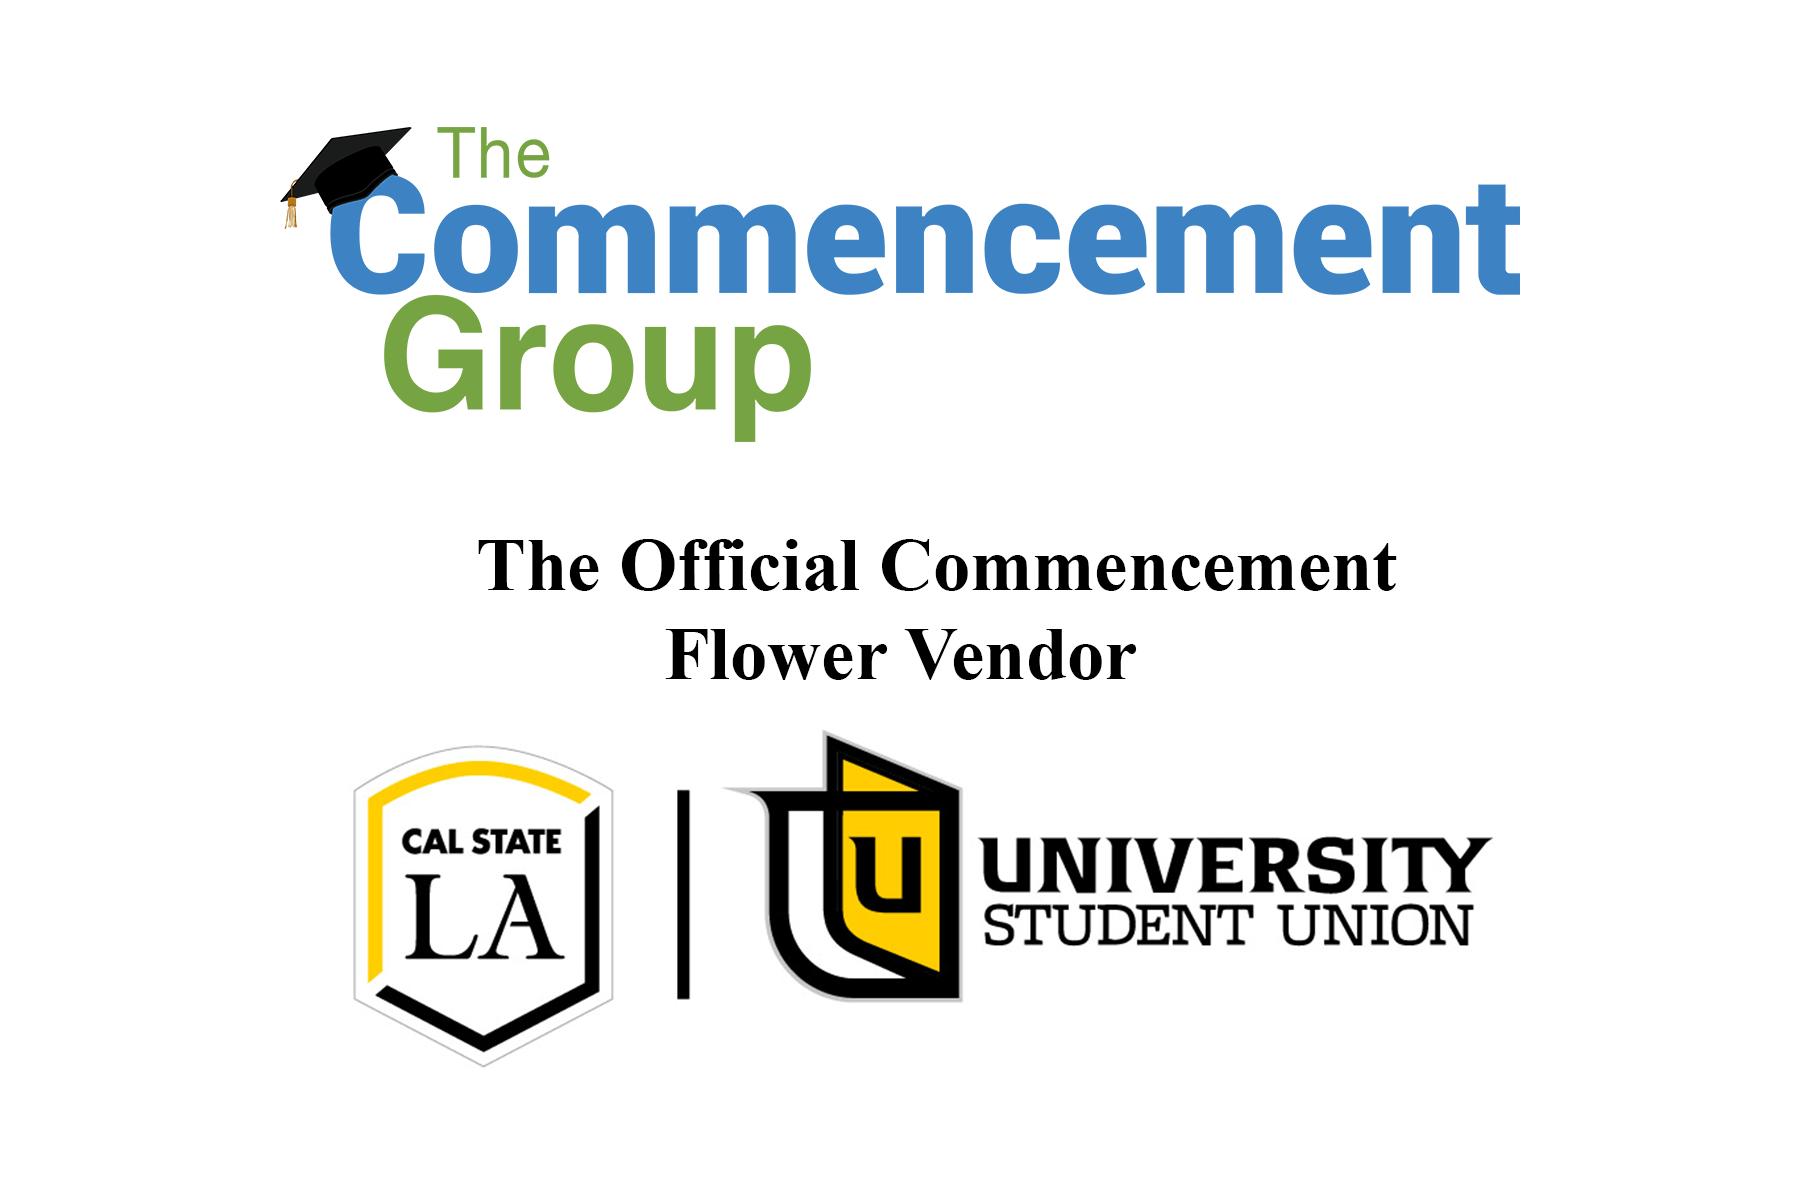 California State University – LA